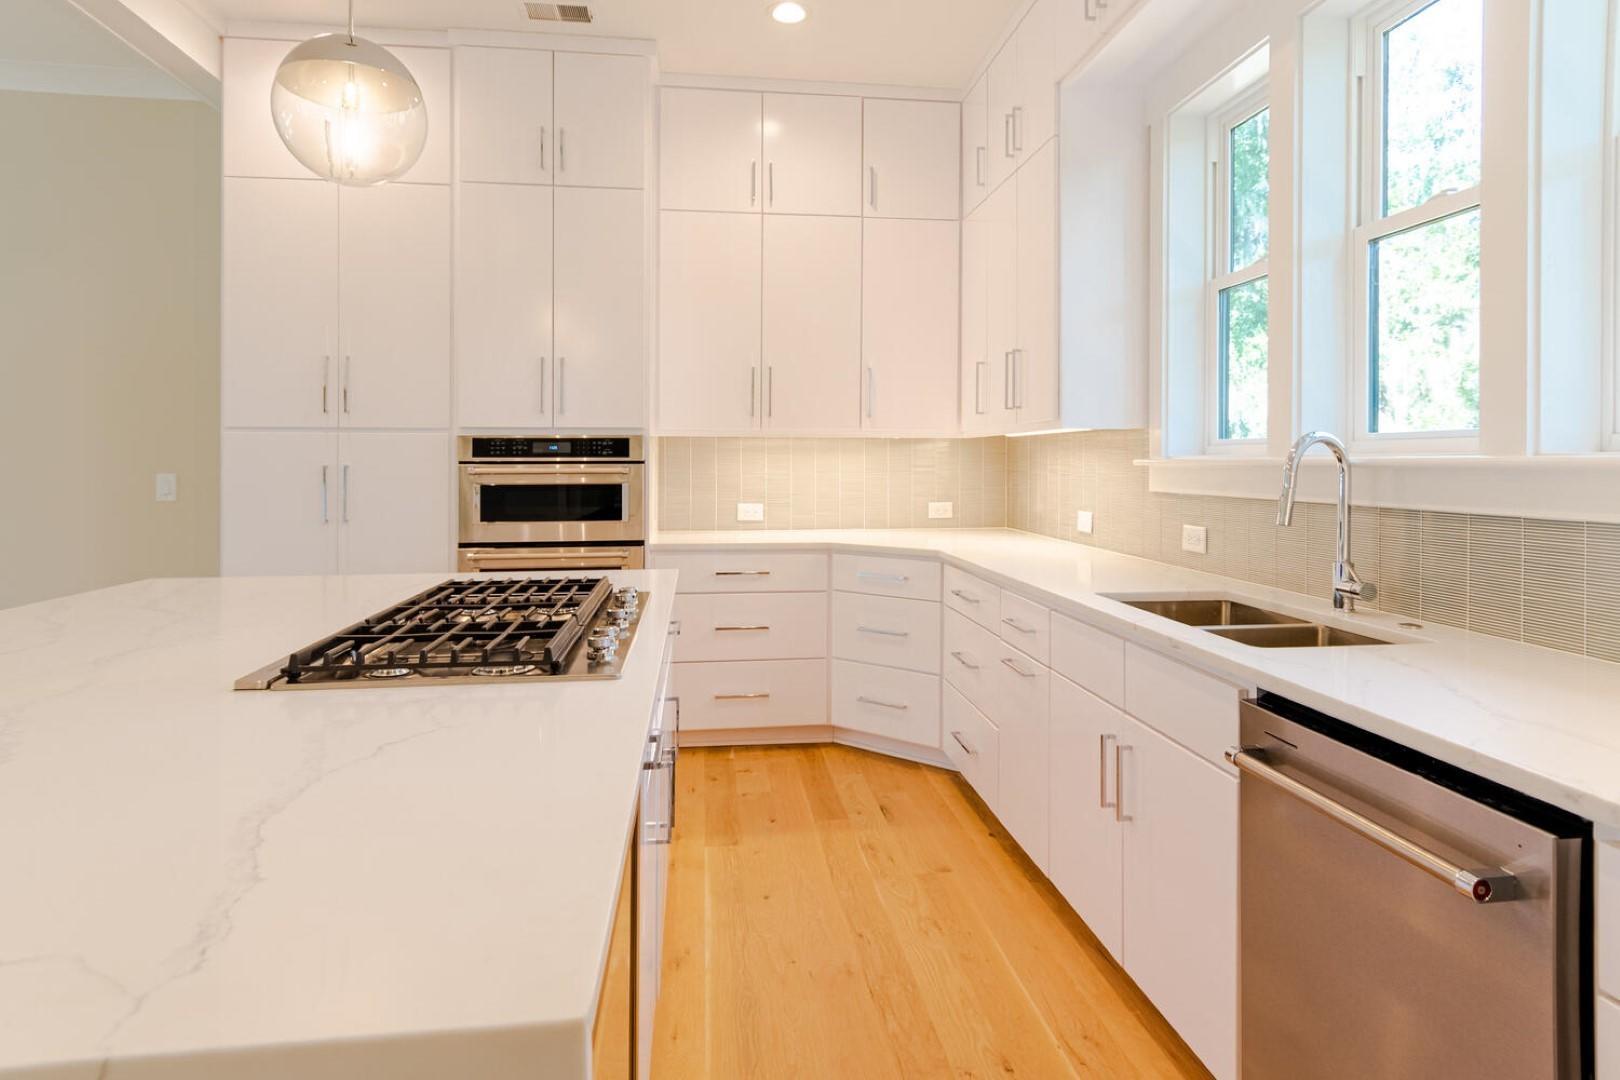 Scanlonville Homes For Sale - 156 5th, Mount Pleasant, SC - 15